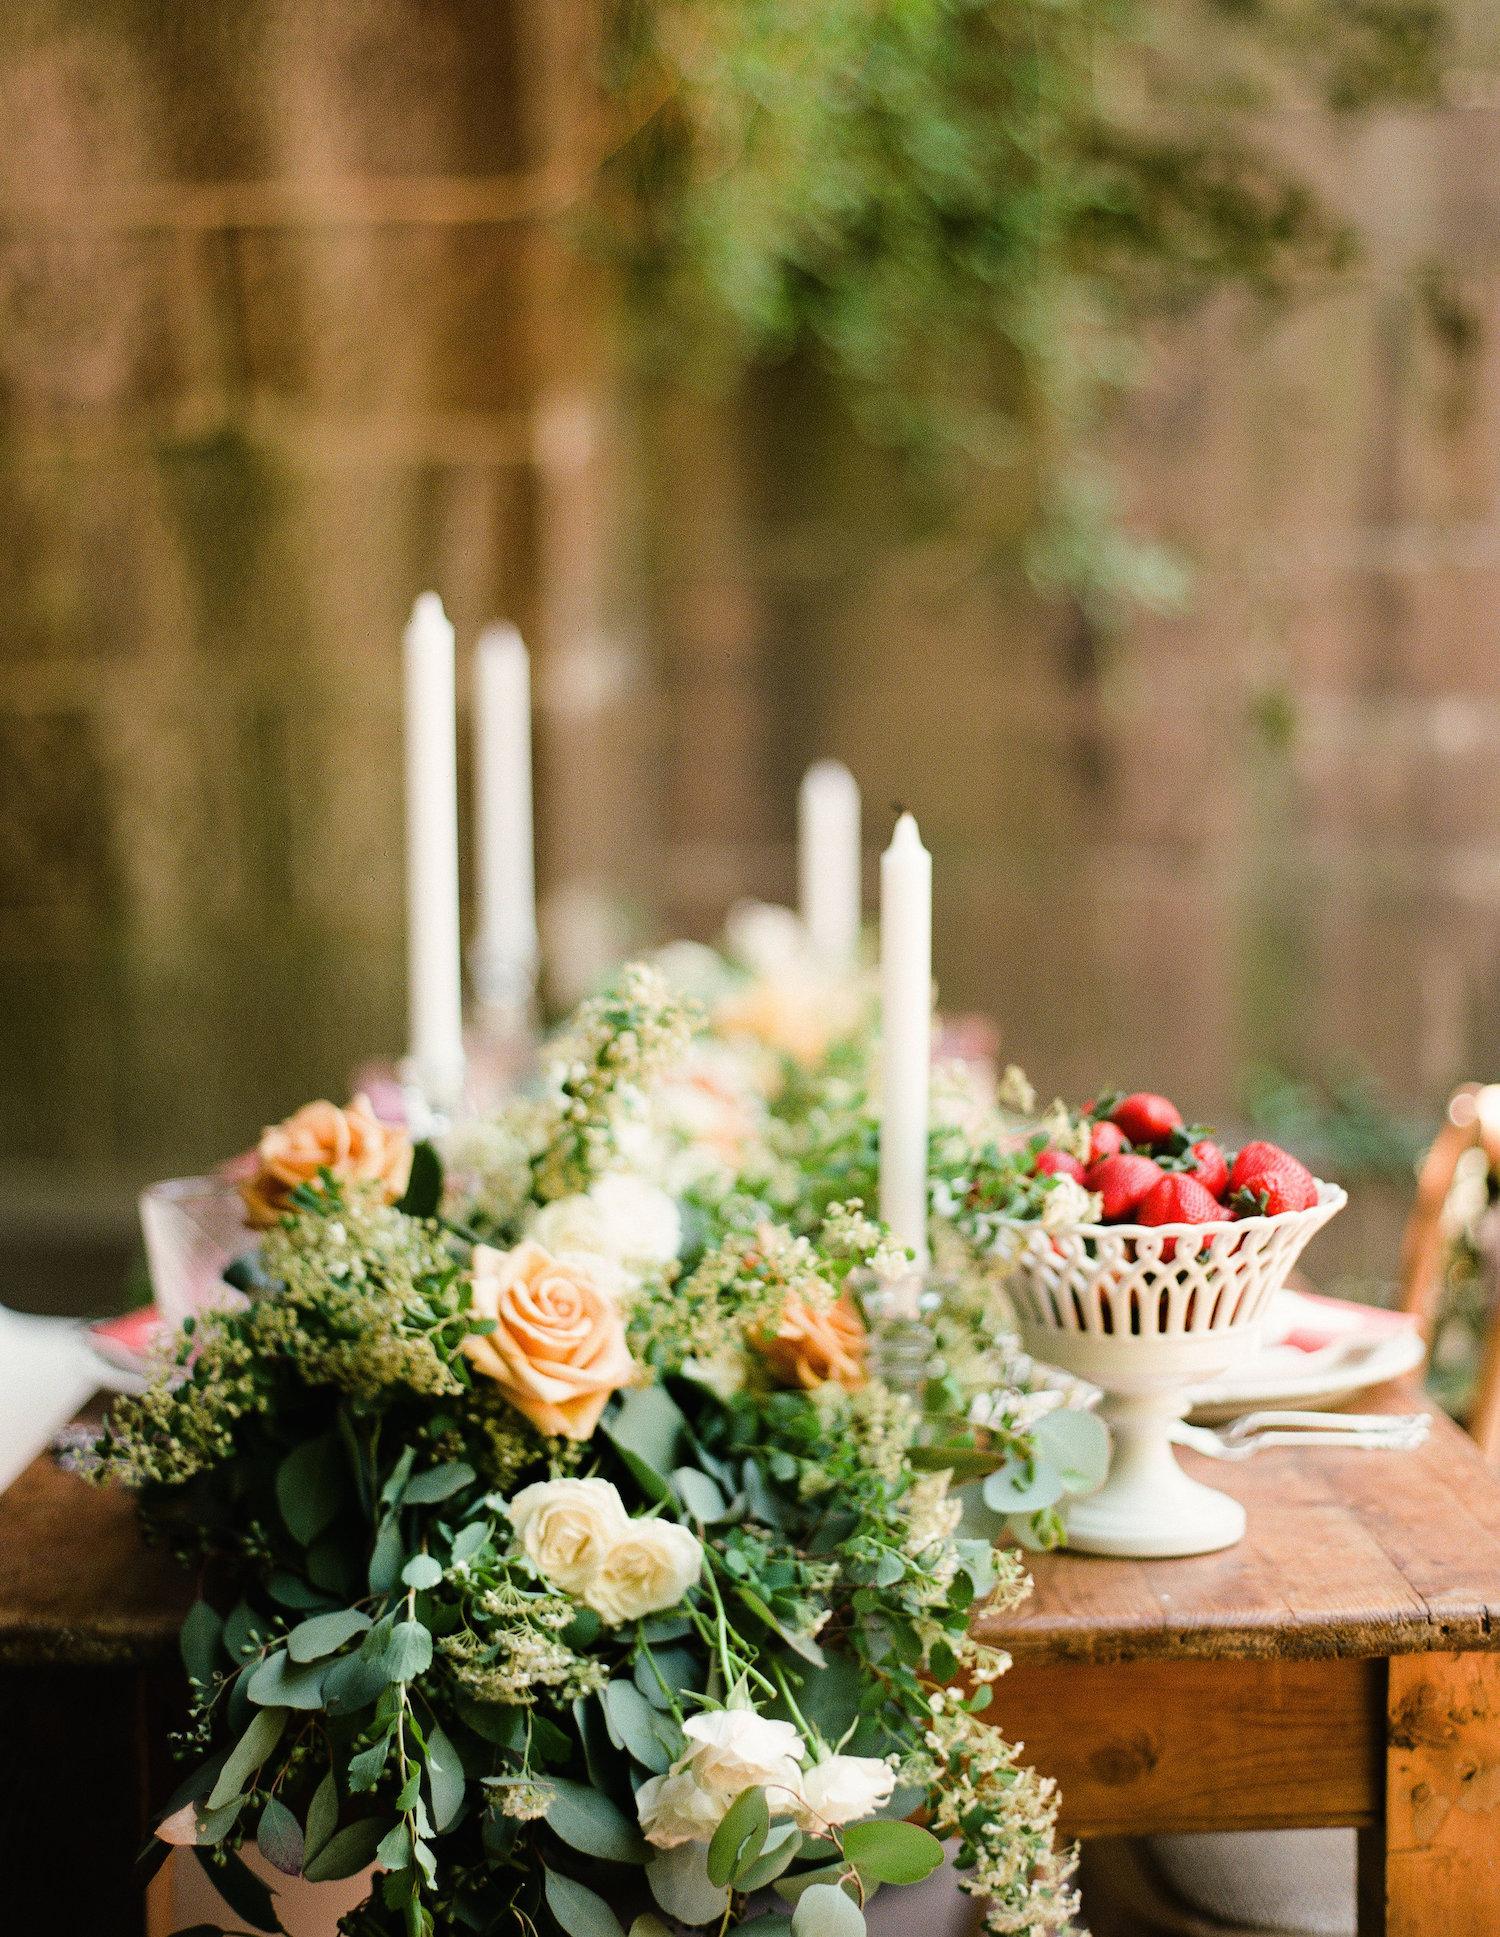 Morning Glow - Full Aperture Floral & Lindsay Madden Photography 77.jpeg